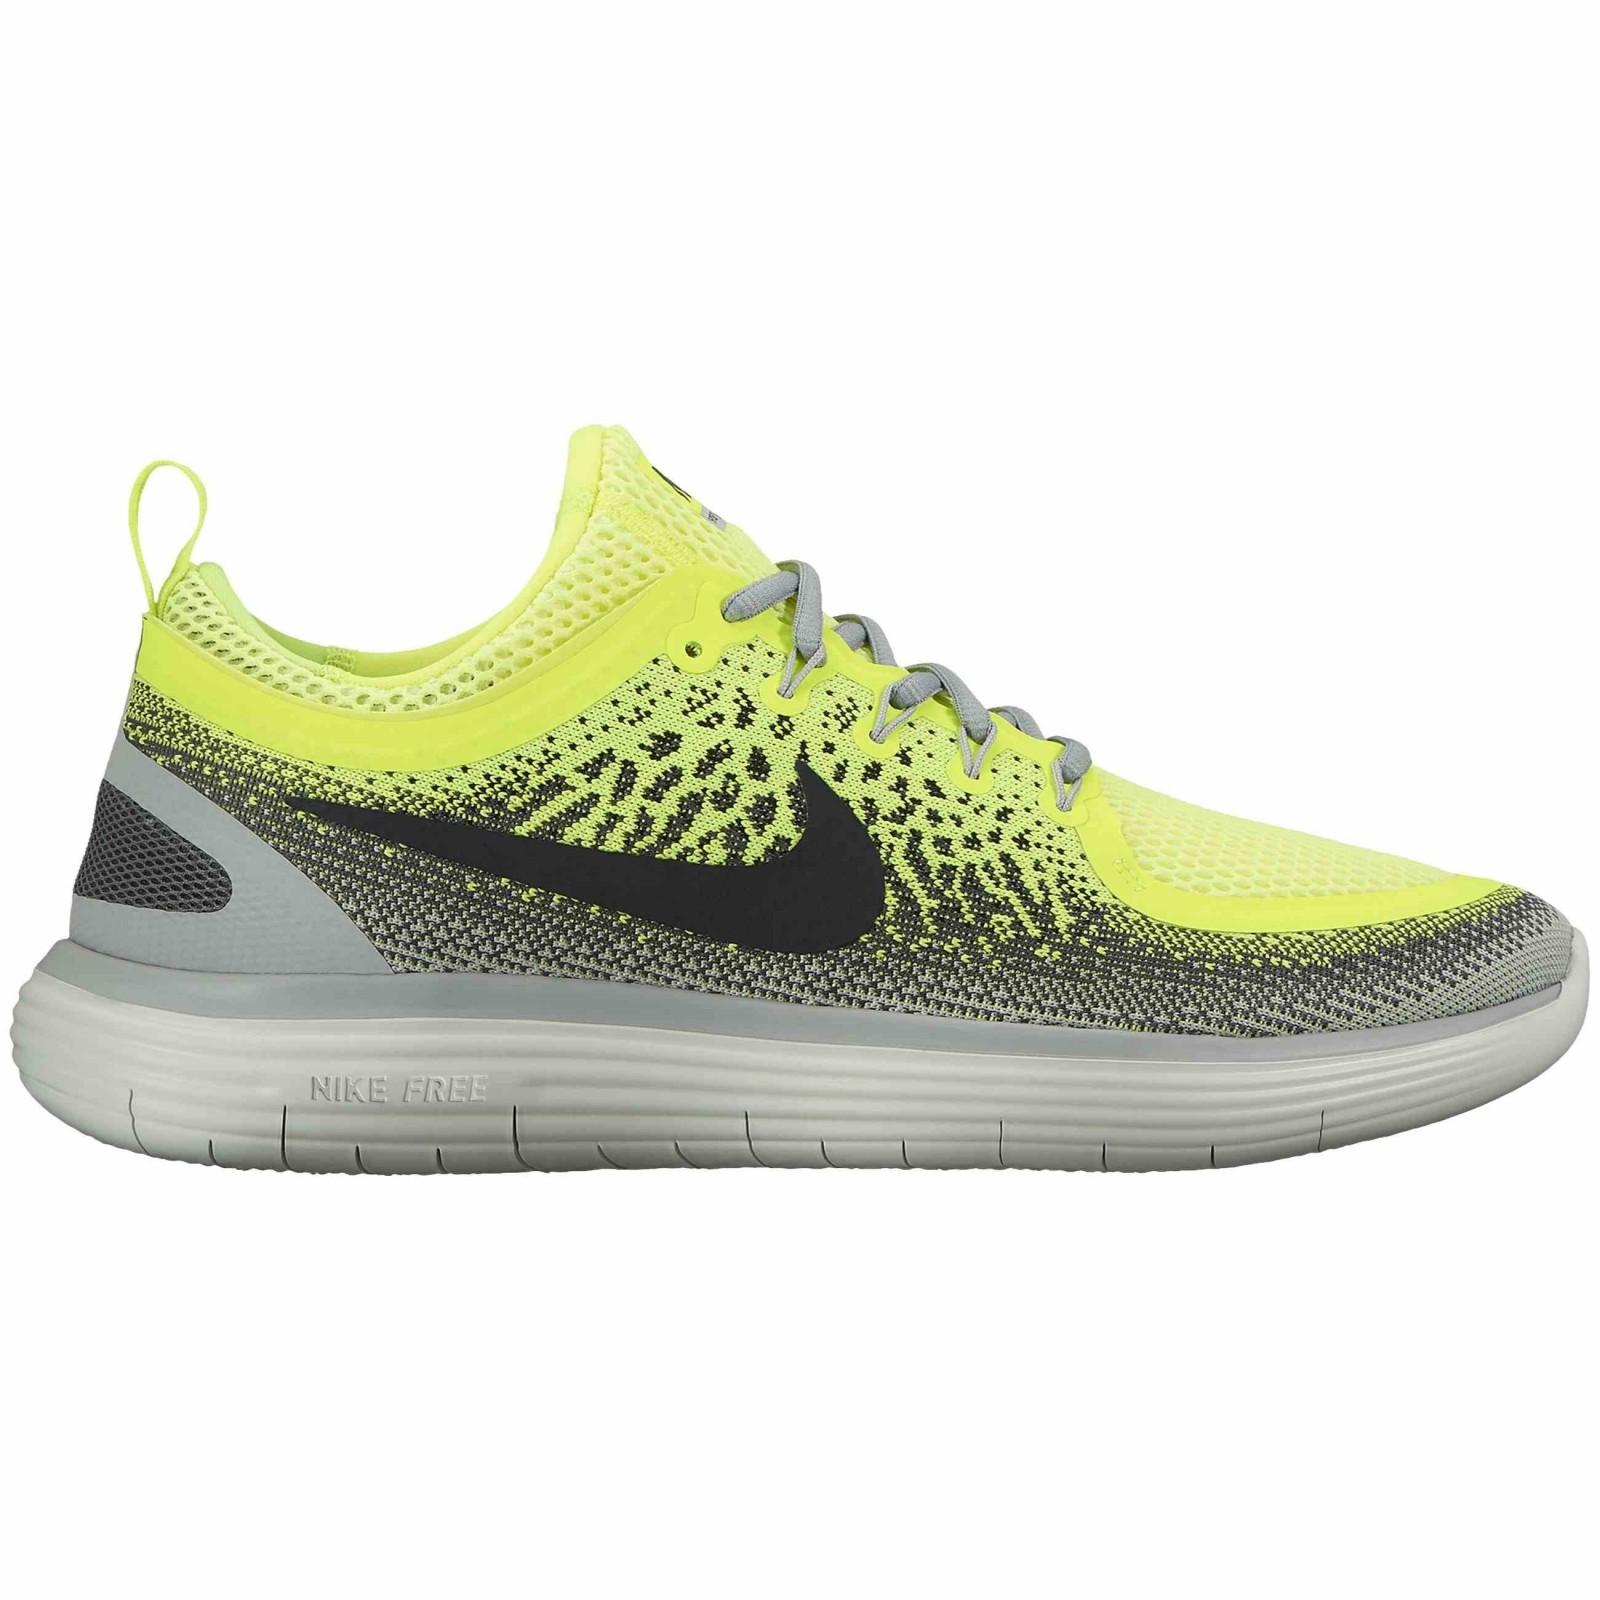 Pánské běžecké boty Nike FREE RN DISTANCE 2  d322a1b1d1